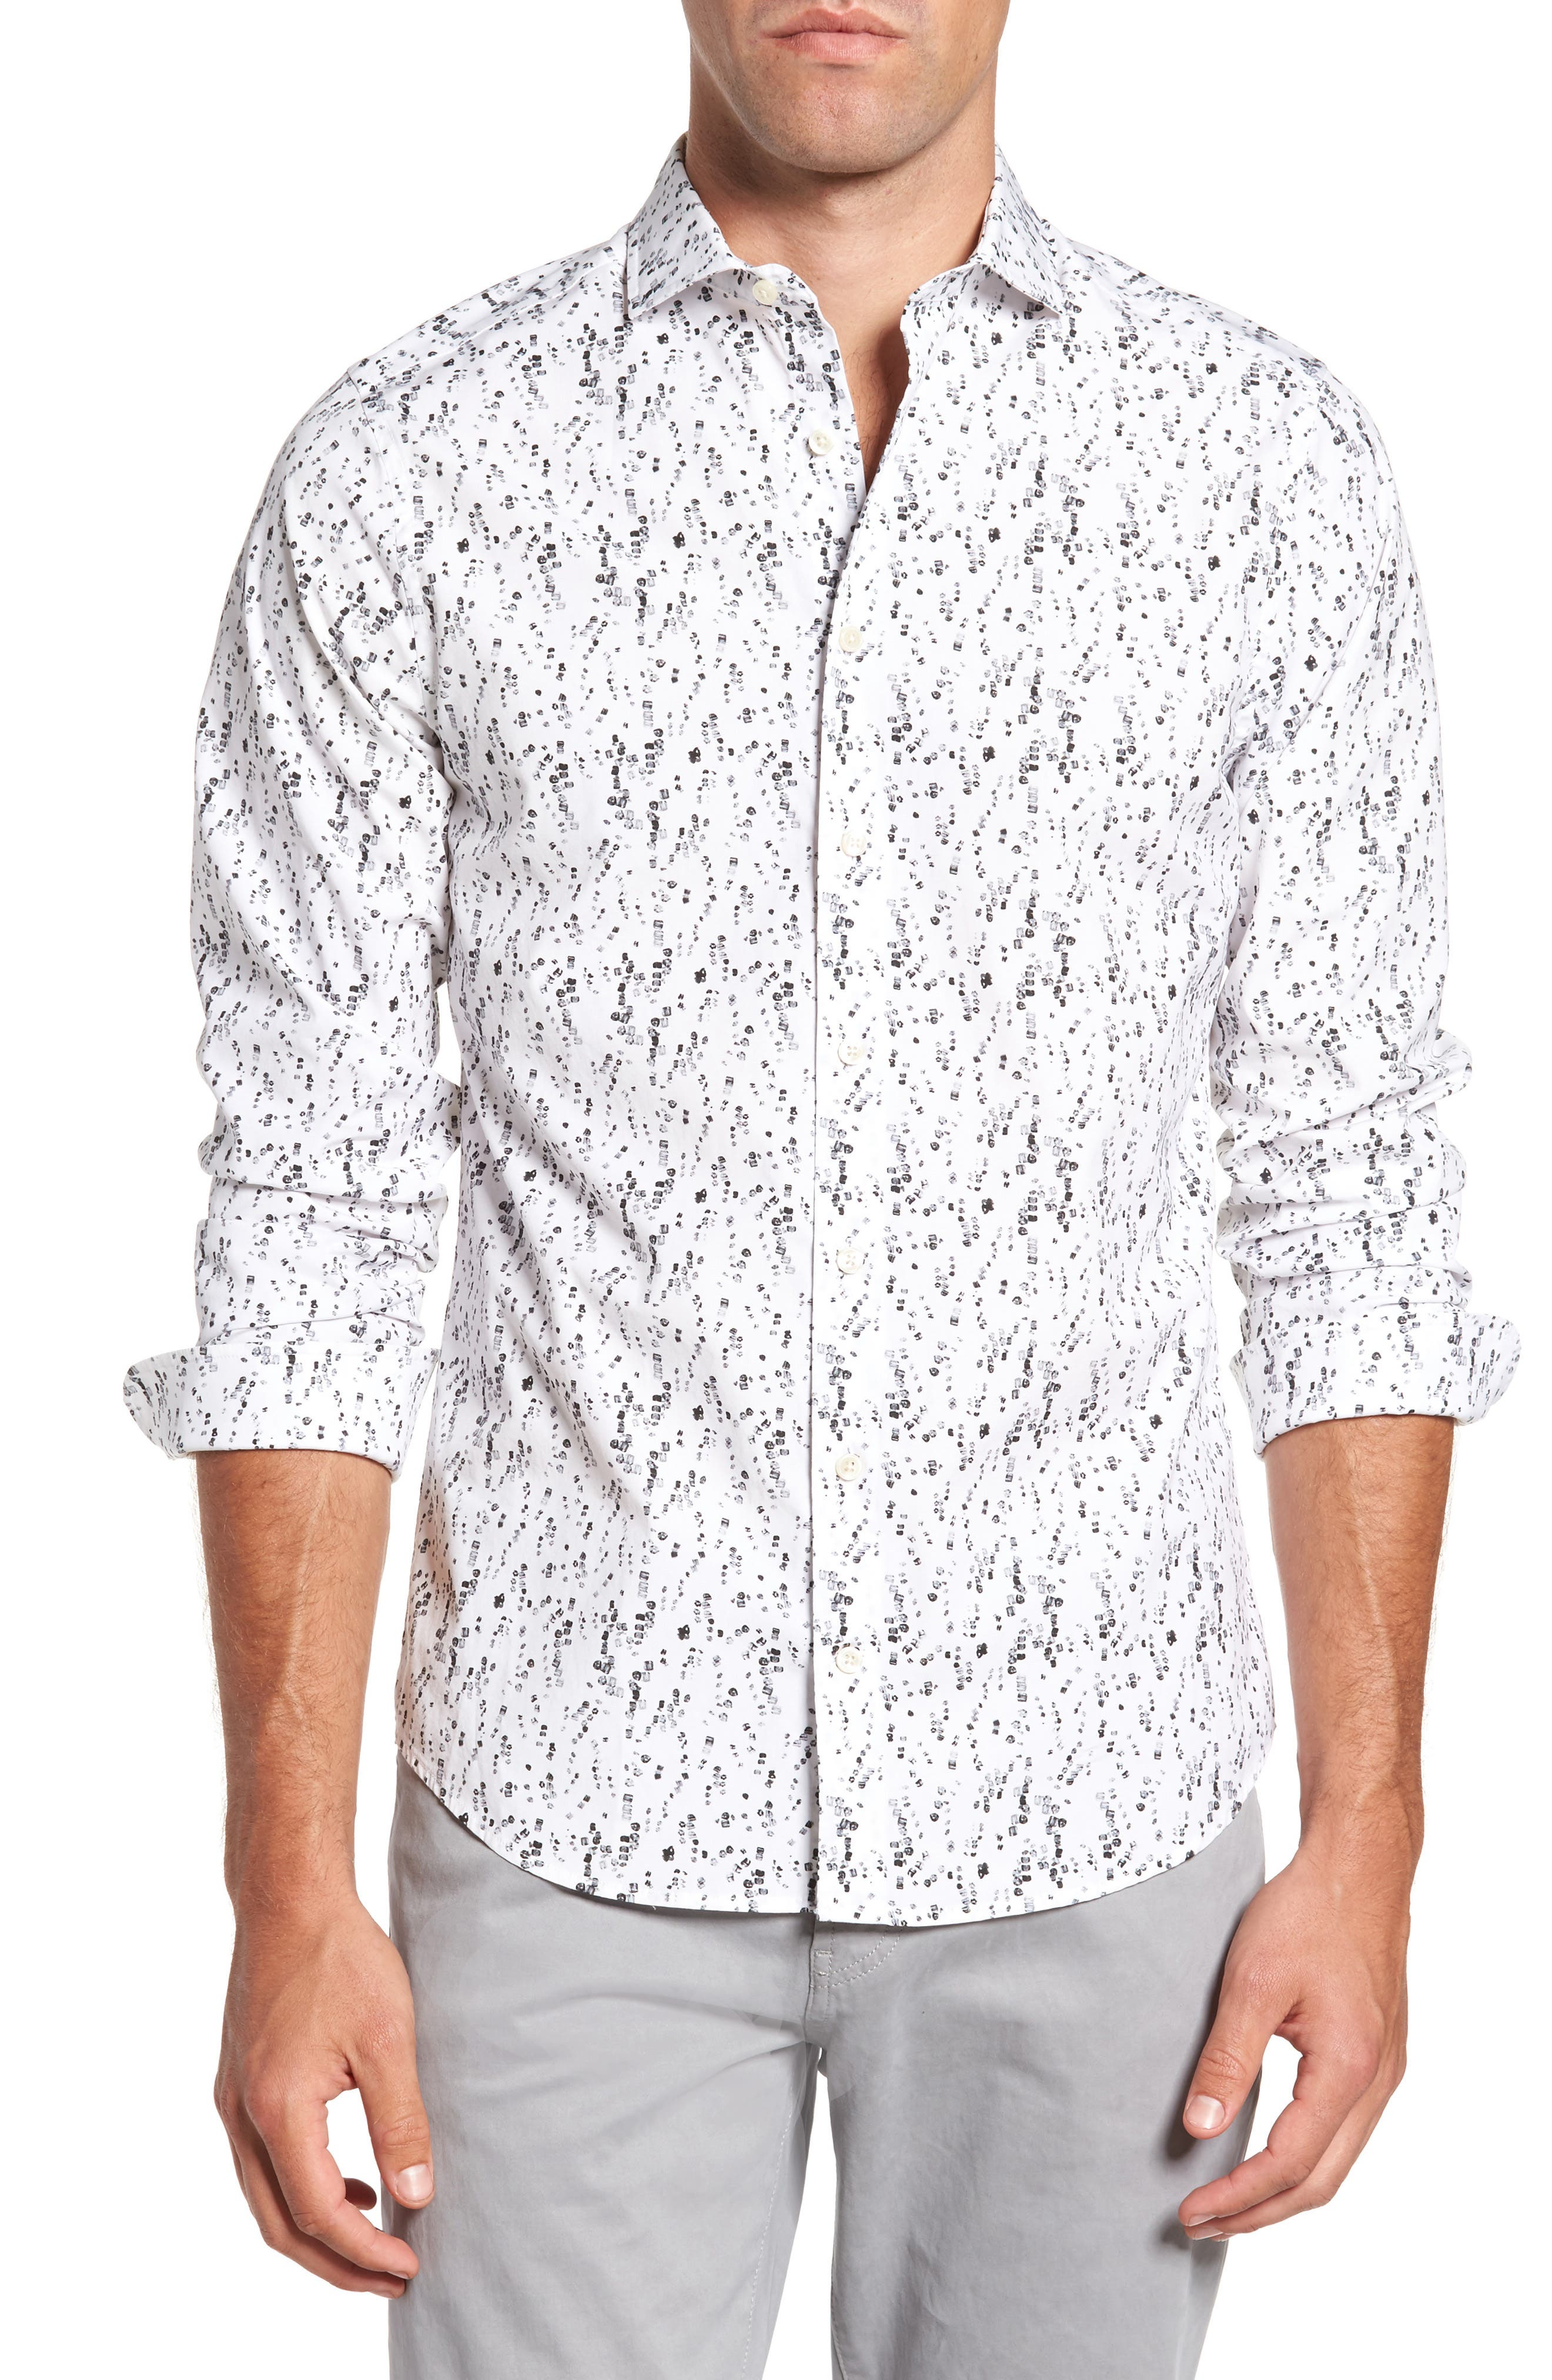 Gant Slim Fit Crushed Ice Print Sport Shirt